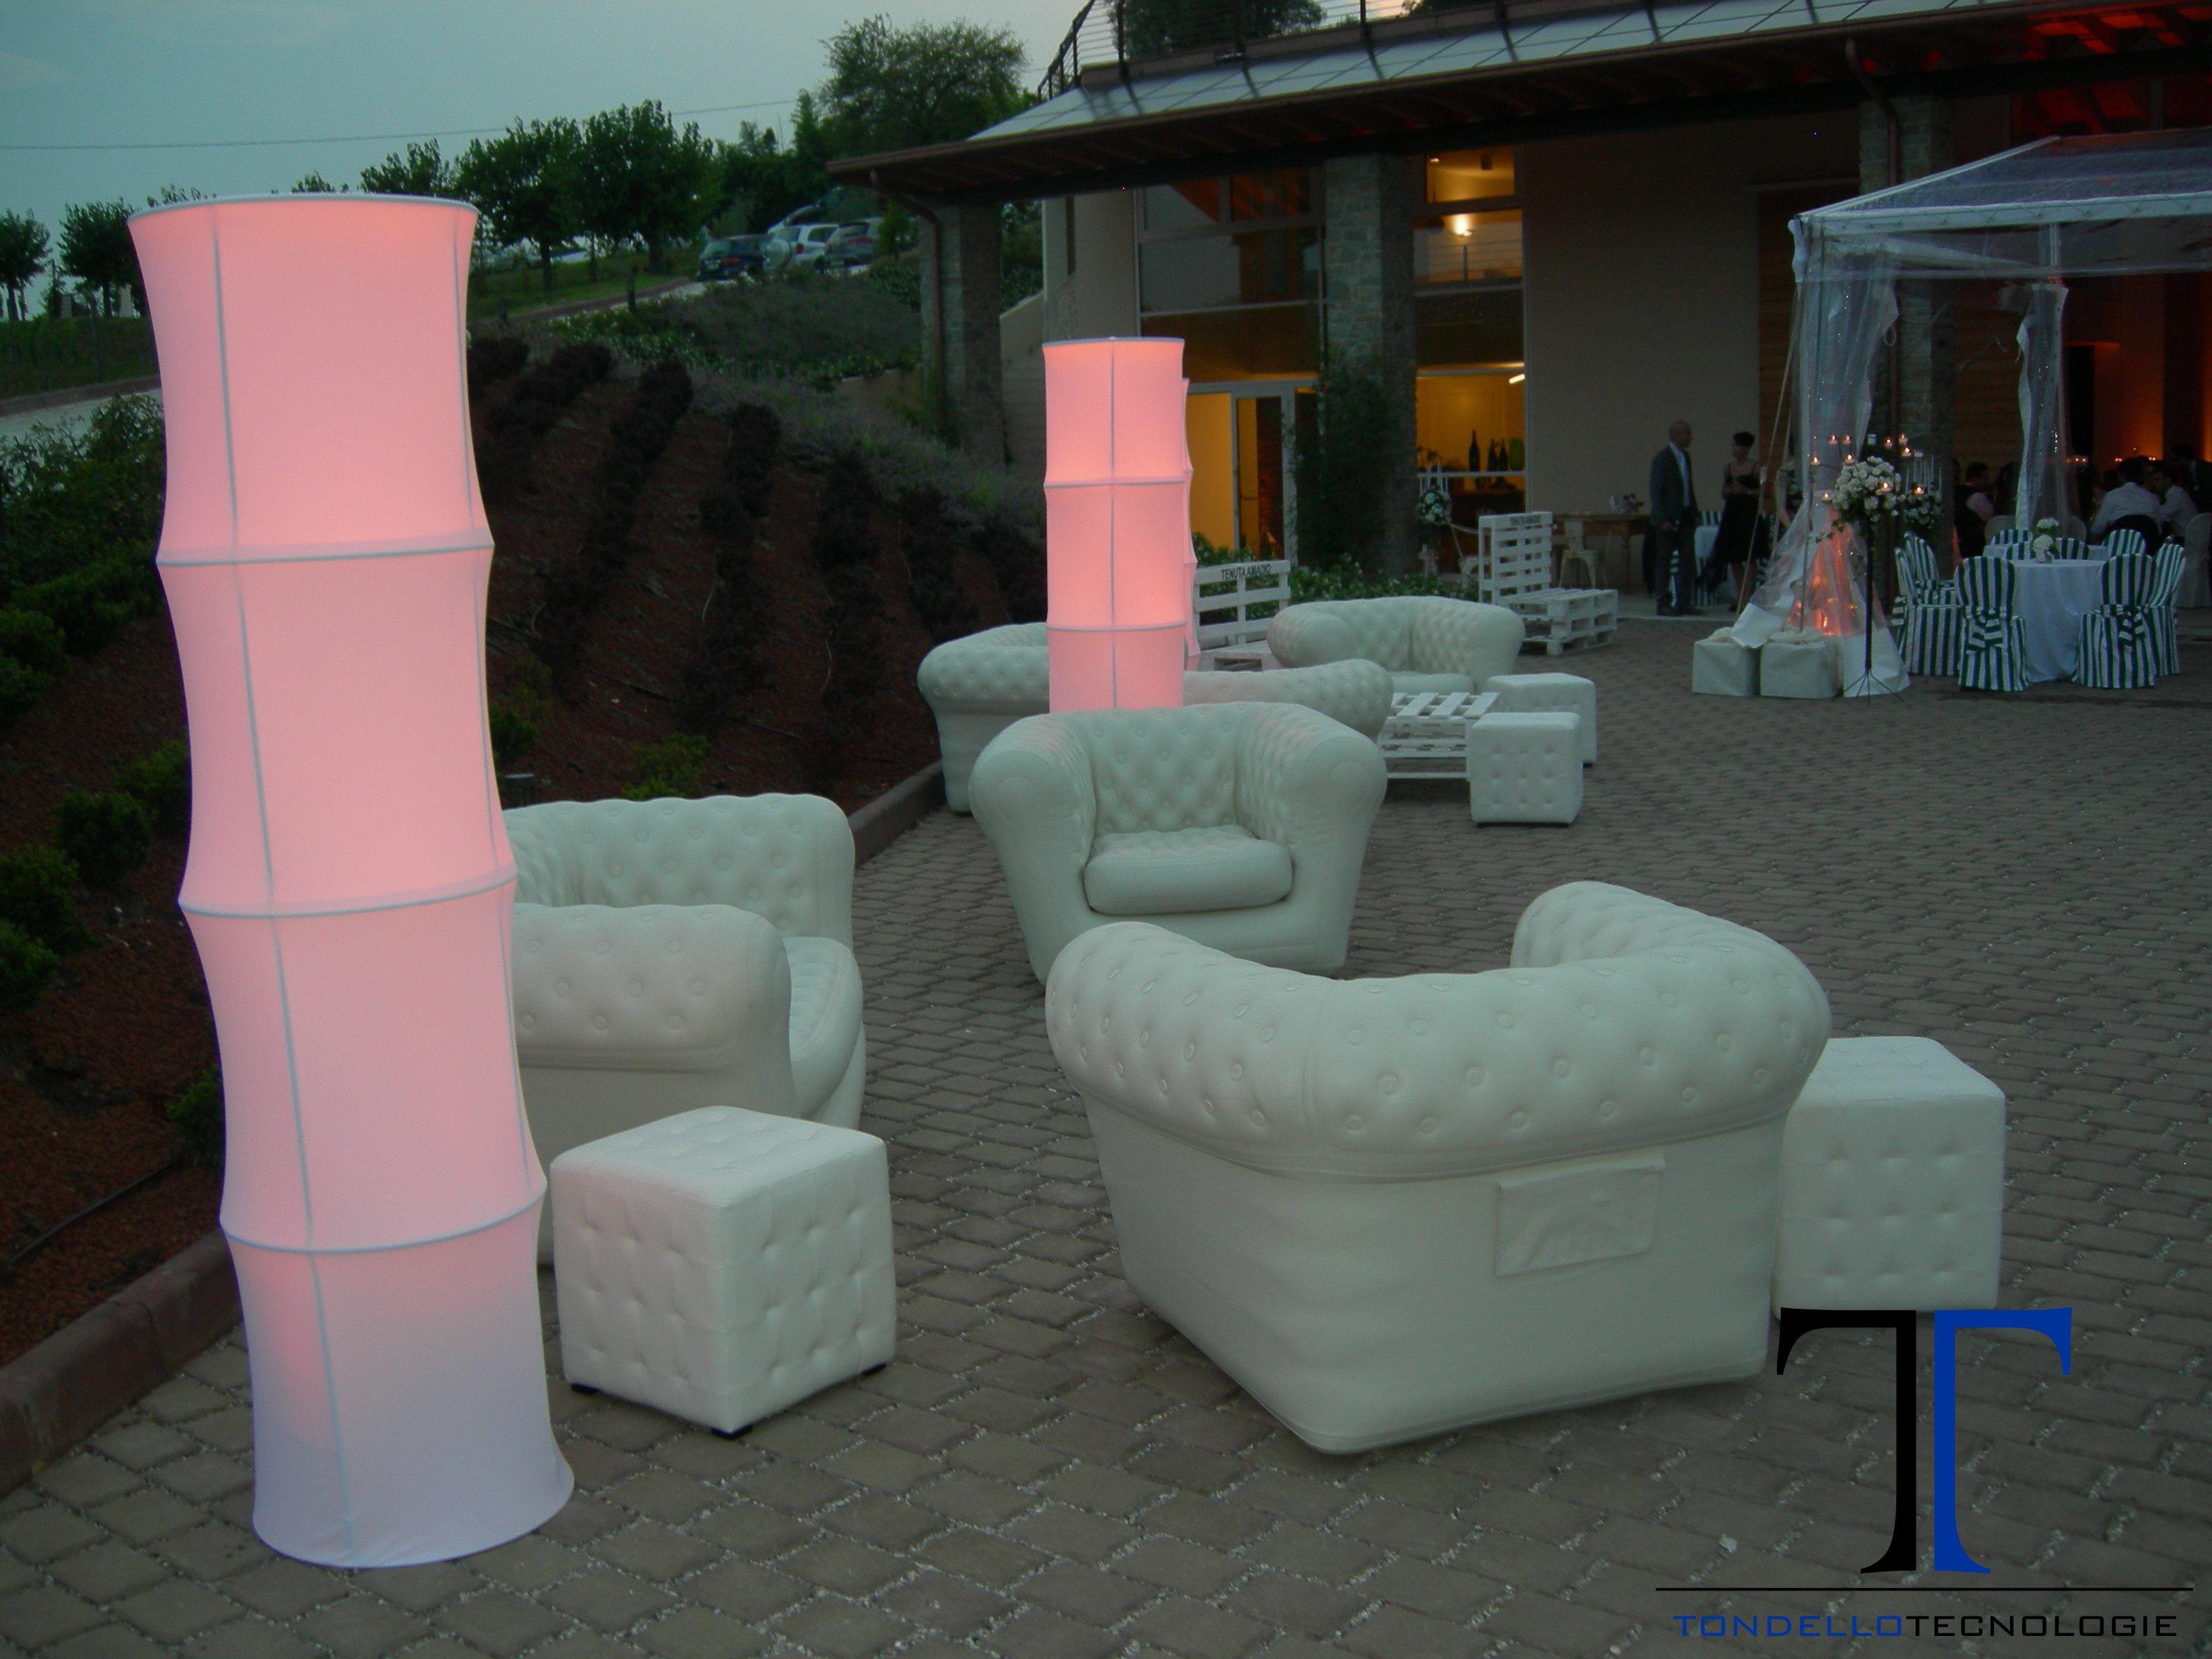 Matrimonio luci architetturali arredi design impianto audio arredo